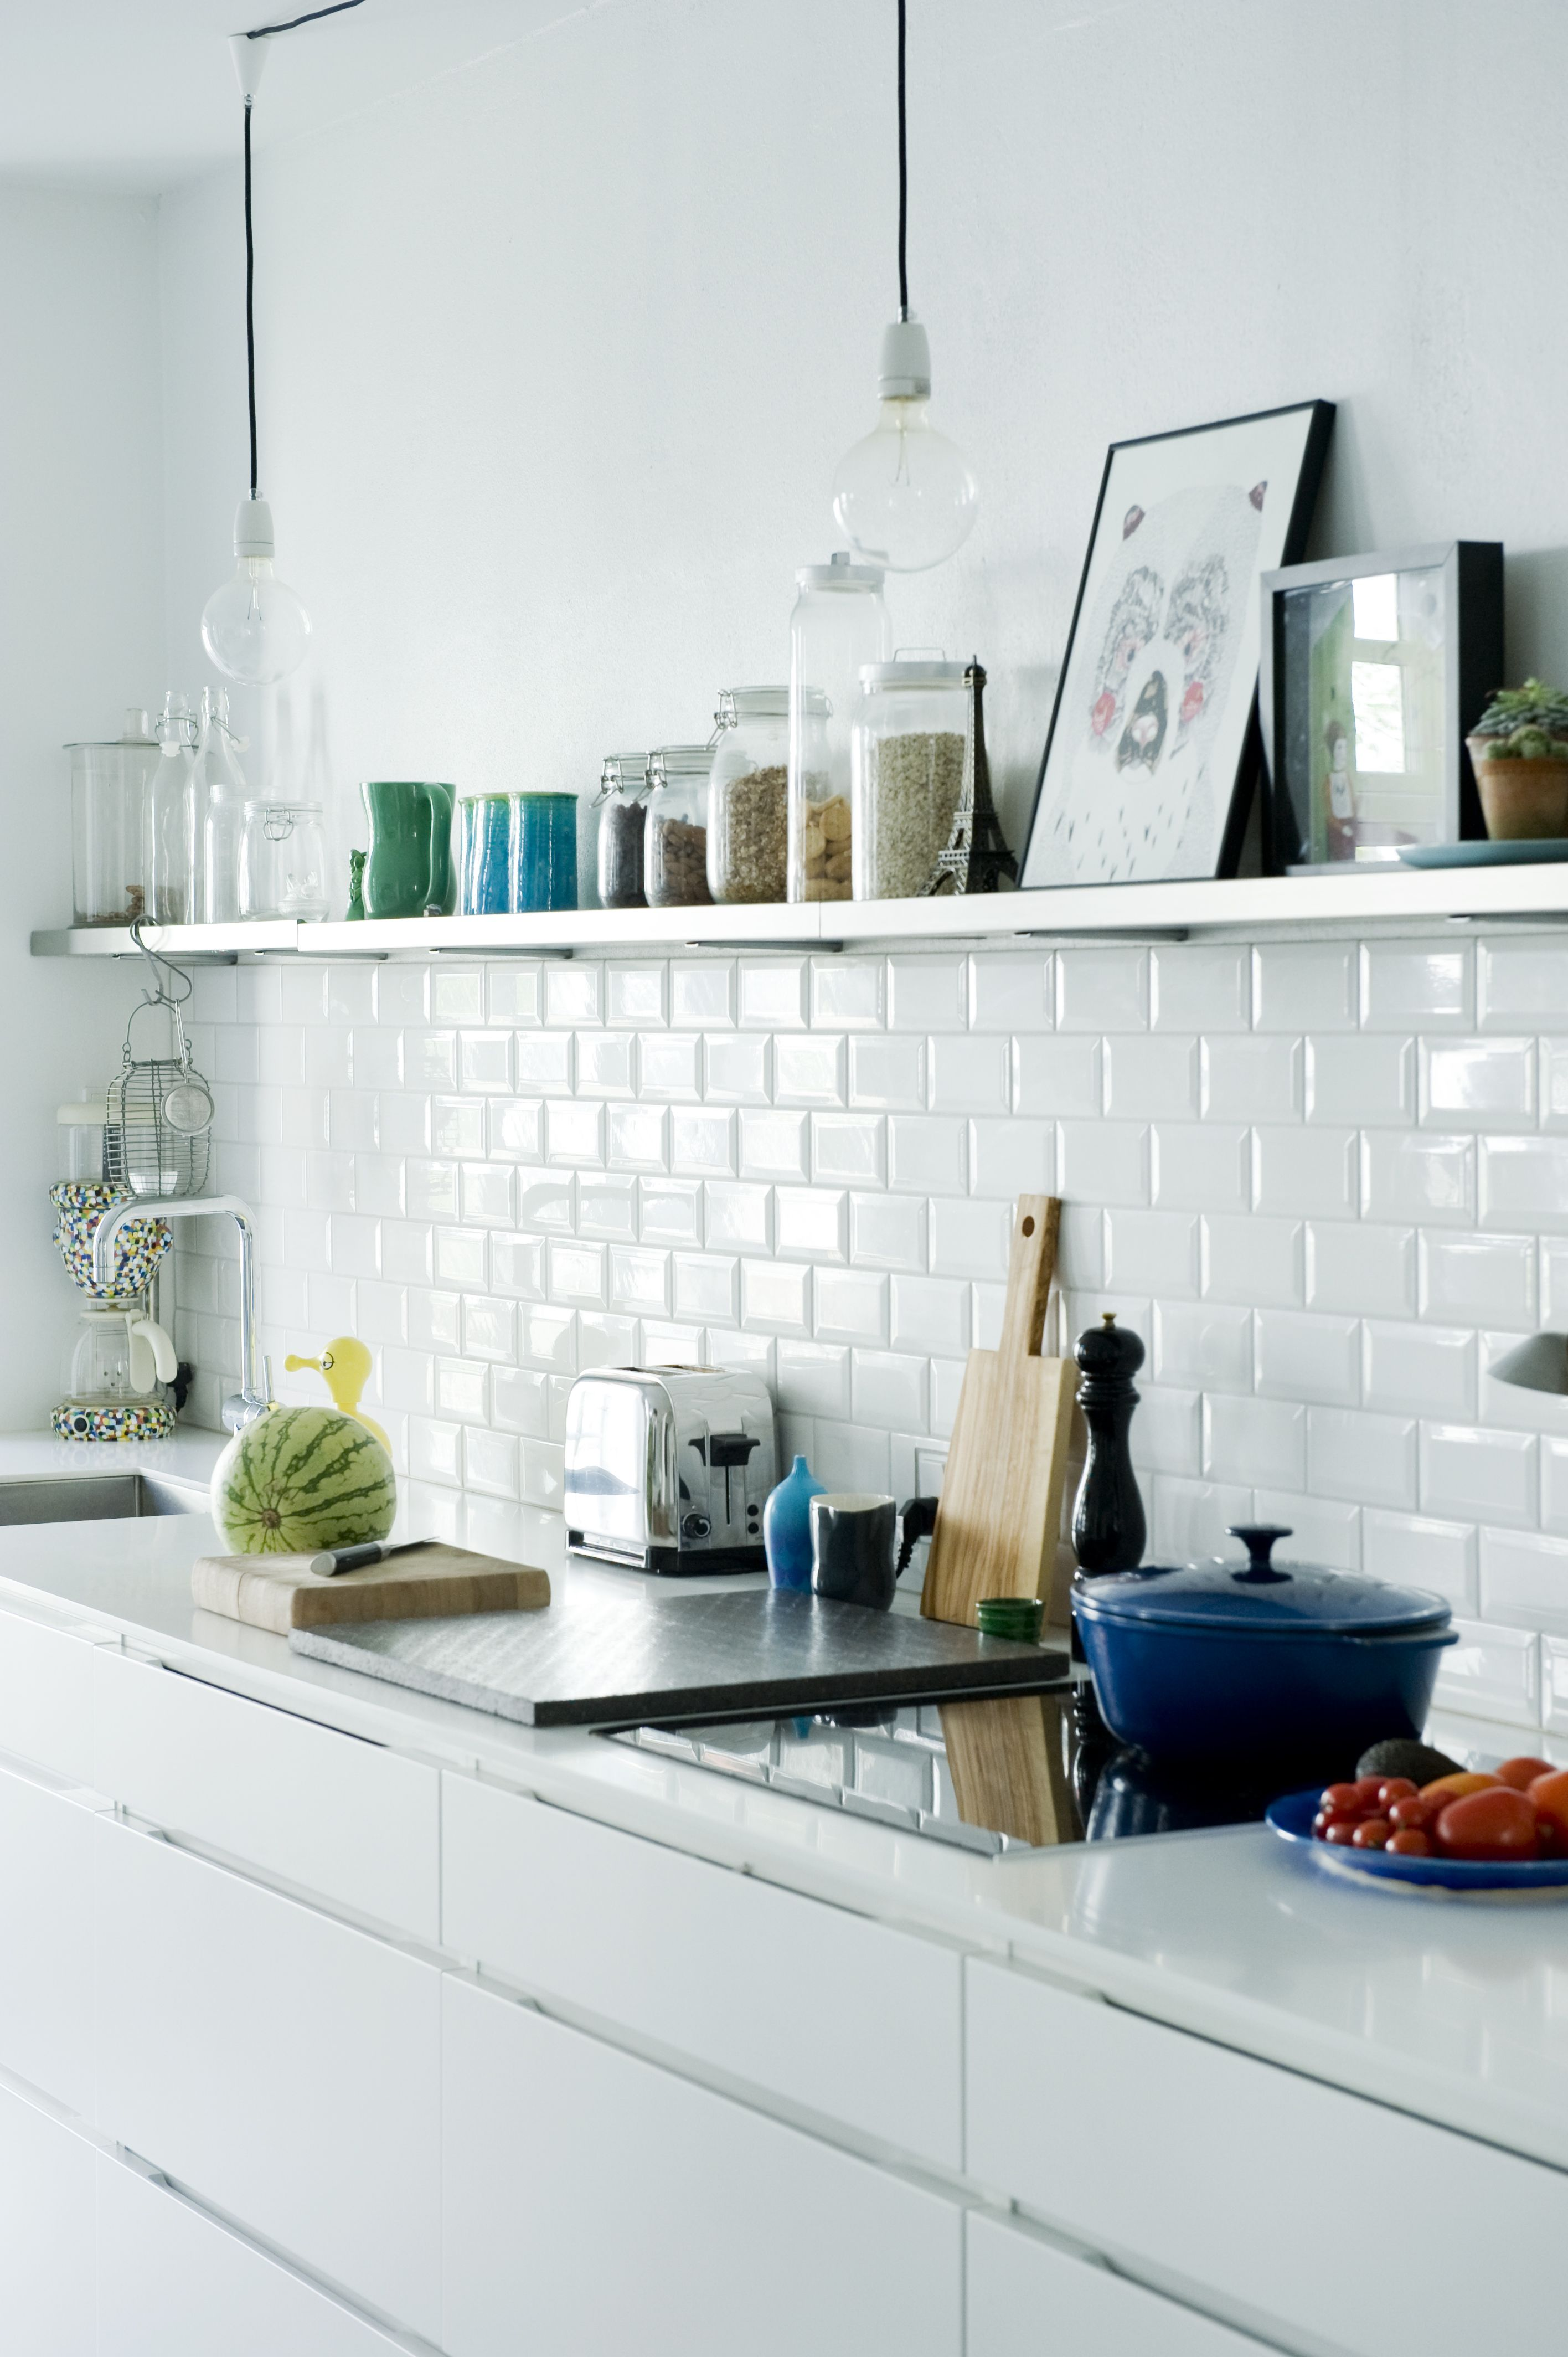 Kitchen Subway Tiles Kok Kok Inspo Inredning